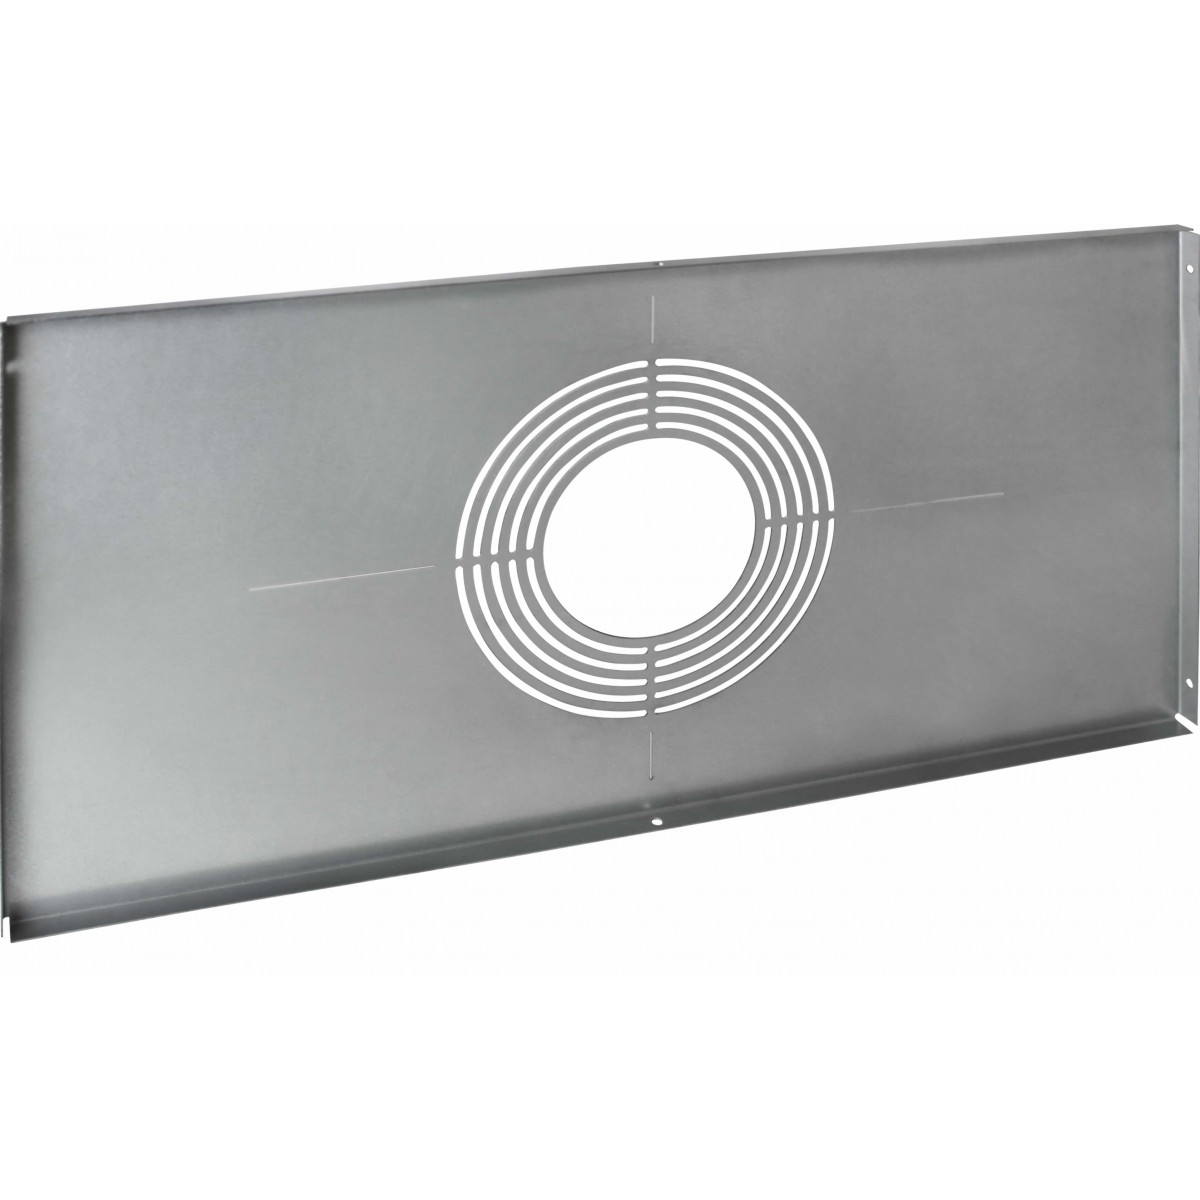 Recessed light adapter plates rap group rap rap t mozeypictures Choice Image